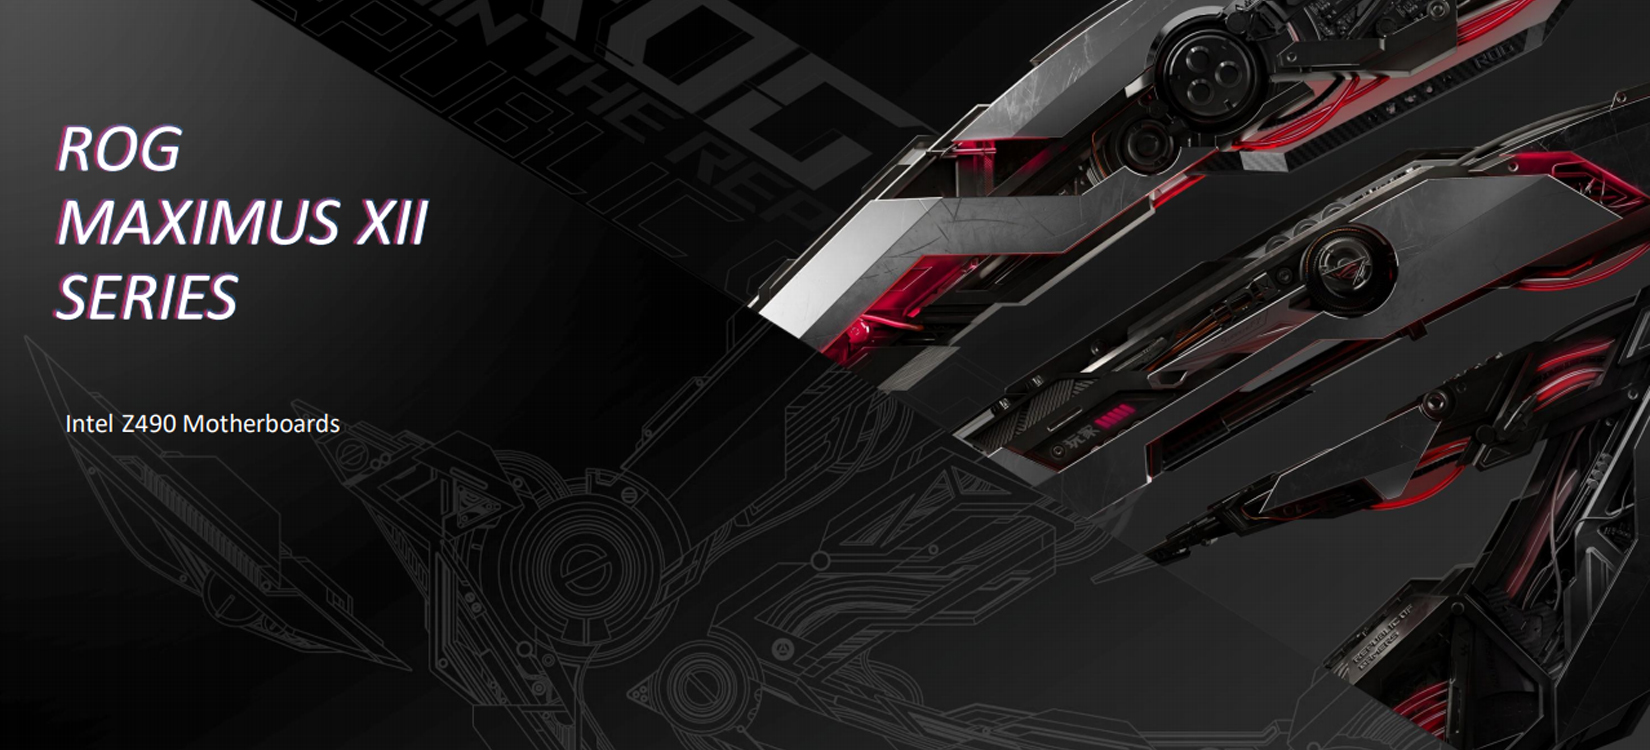 Mainboard ASUS ROG MAXIMUS XII HERO (WI-FI) (Intel Z490, Socket 1200, ATX, 4 khe RAM DDR4)